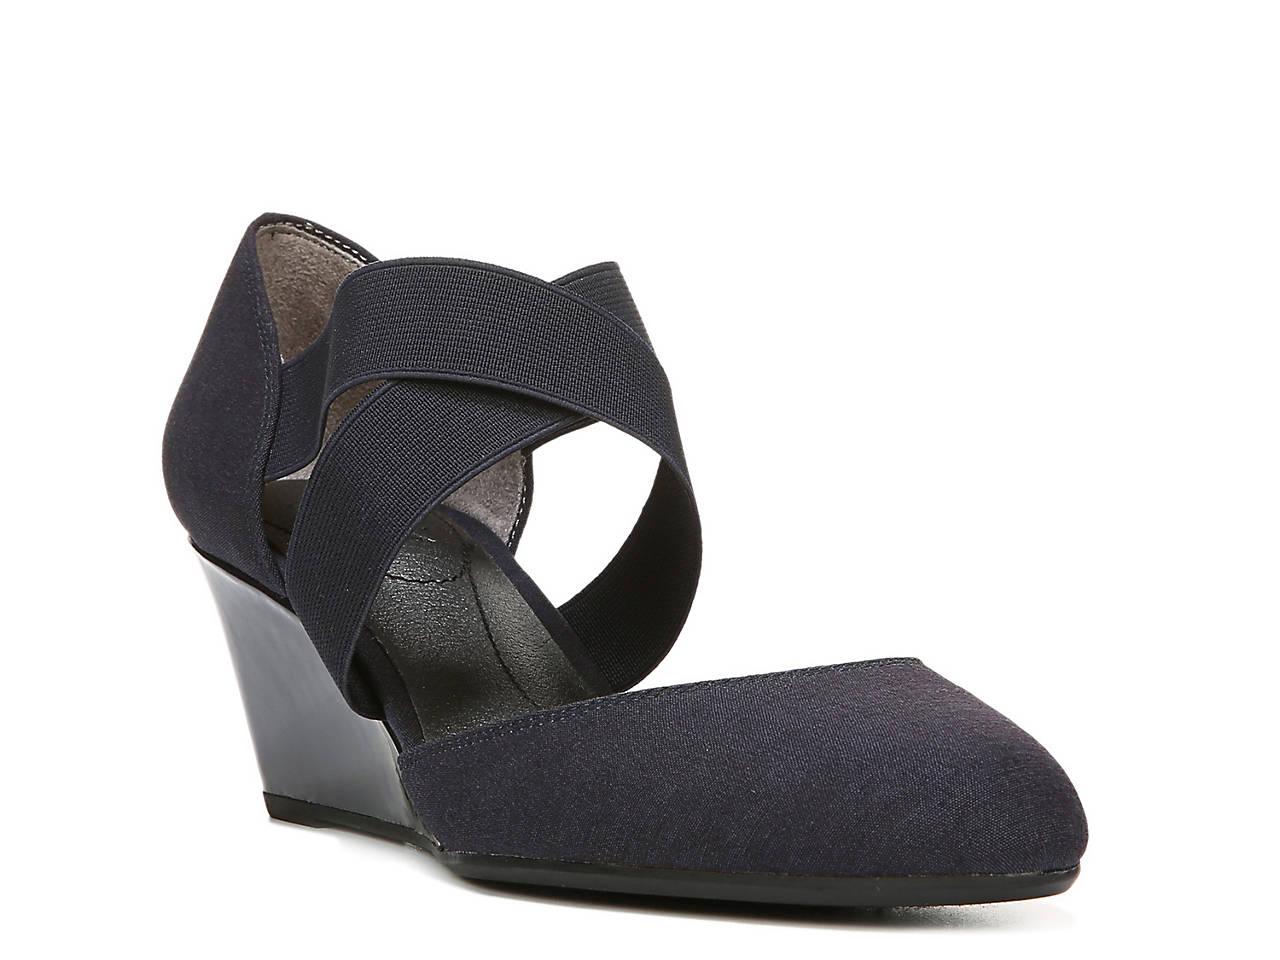 Black sandals at dsw - Darcy Wedge Pump